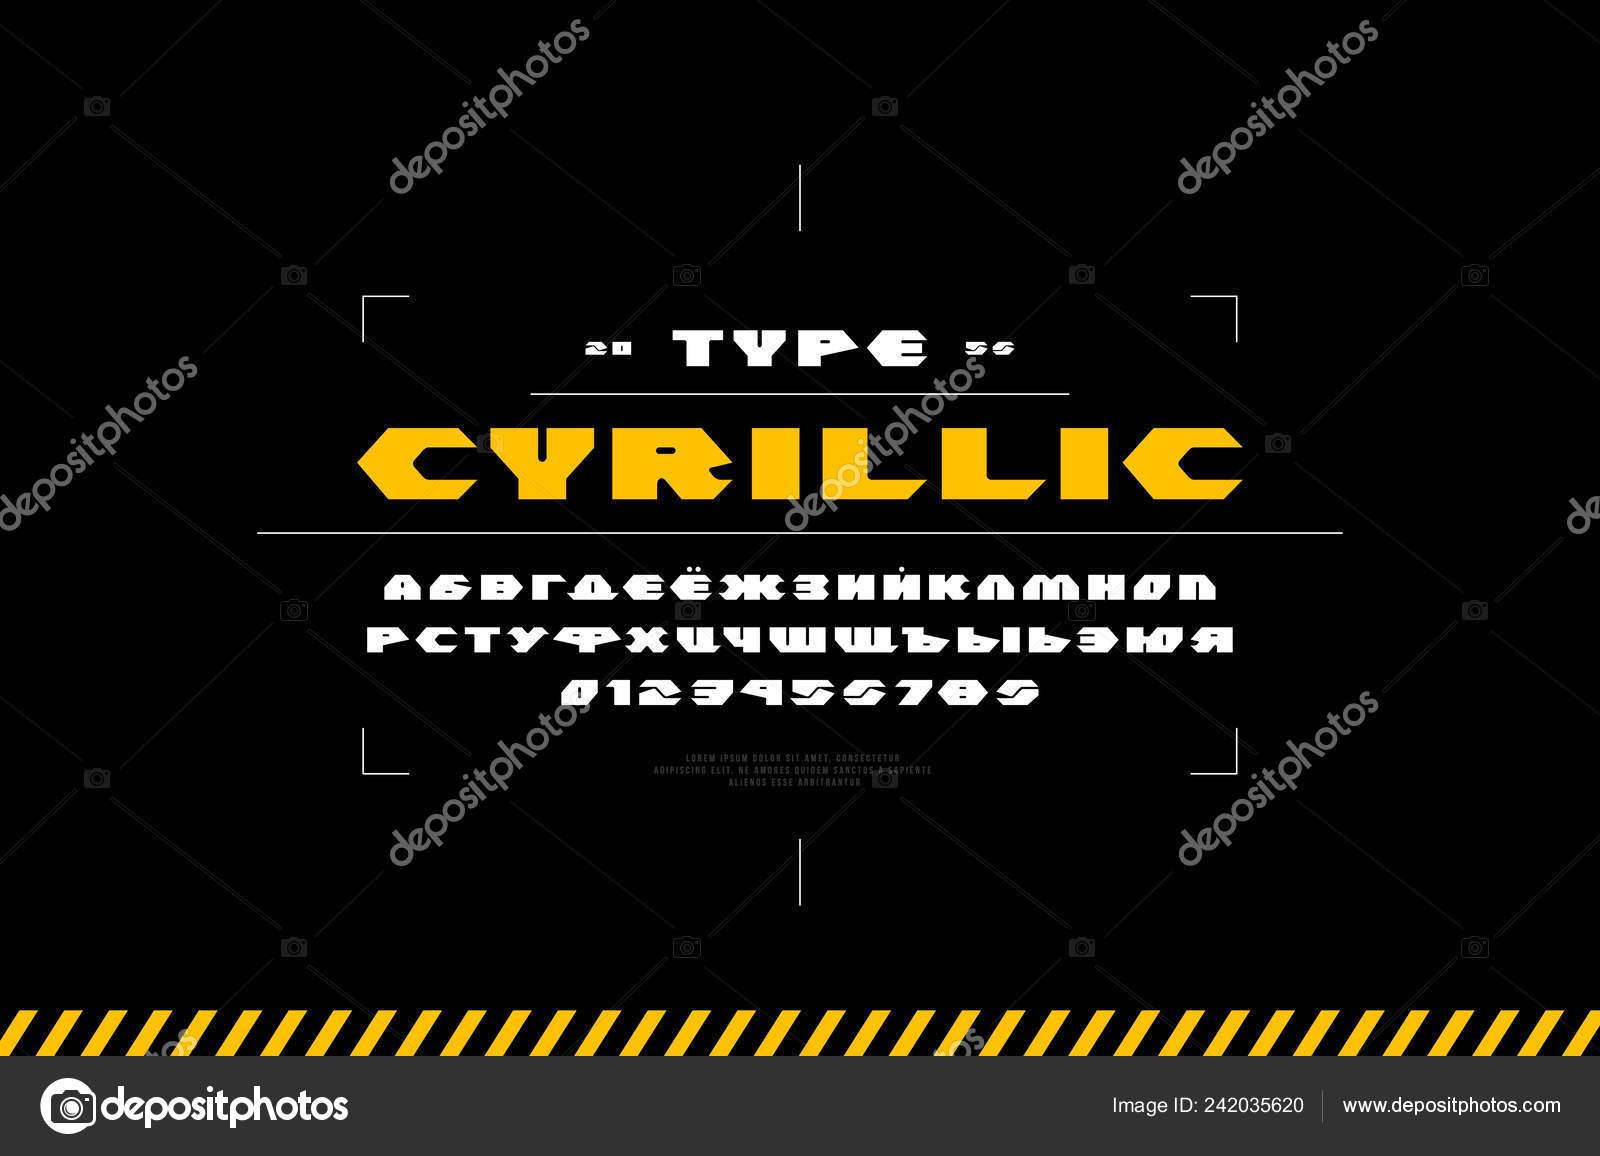 Geometric Sans Serif Font Futuristic Style Cyrillic Letters Numbers Sci Stock Vector C Neuevector 242035620